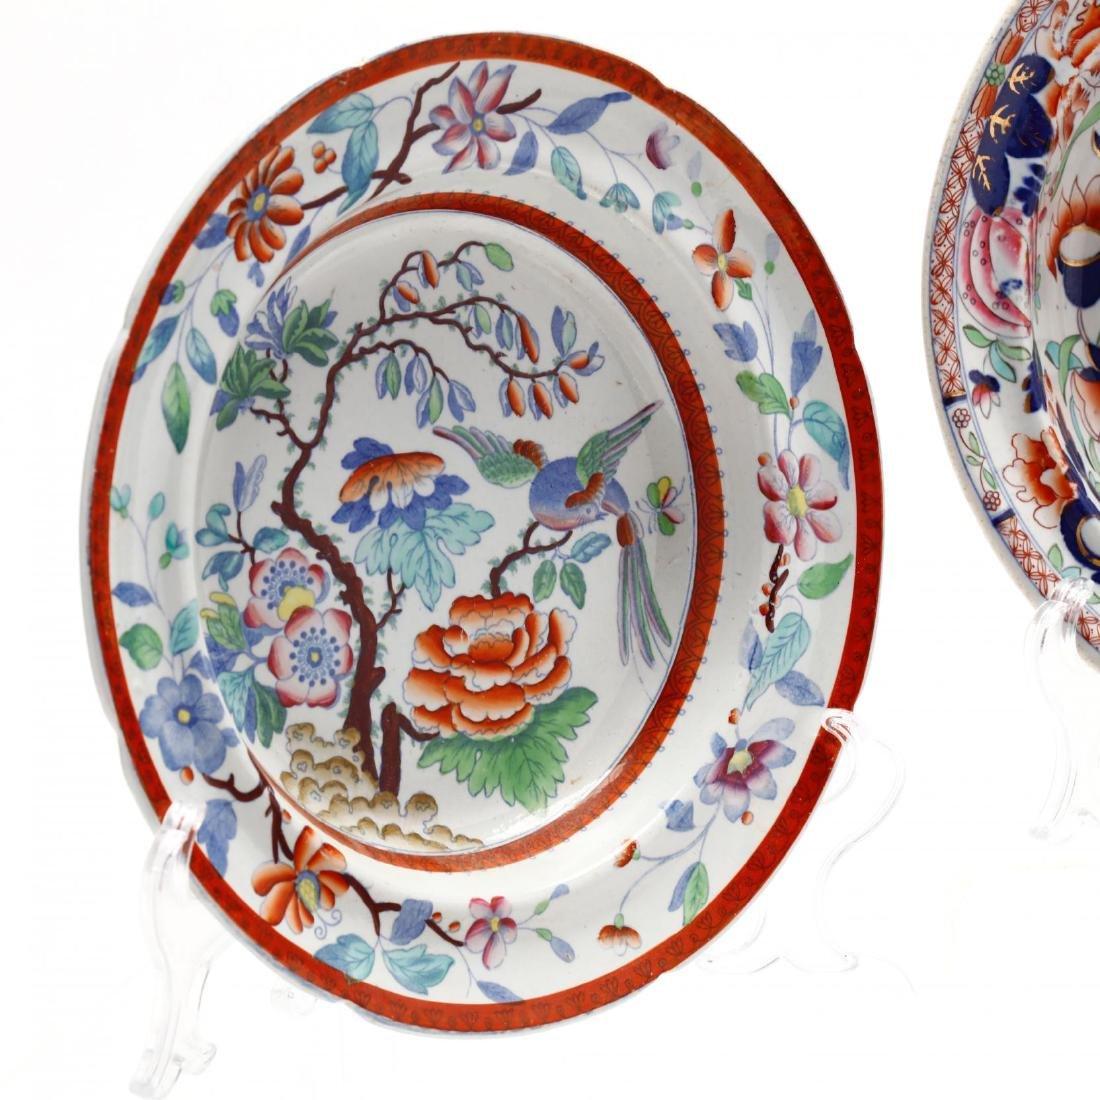 A Collection of Antique Soup Bowls - 9